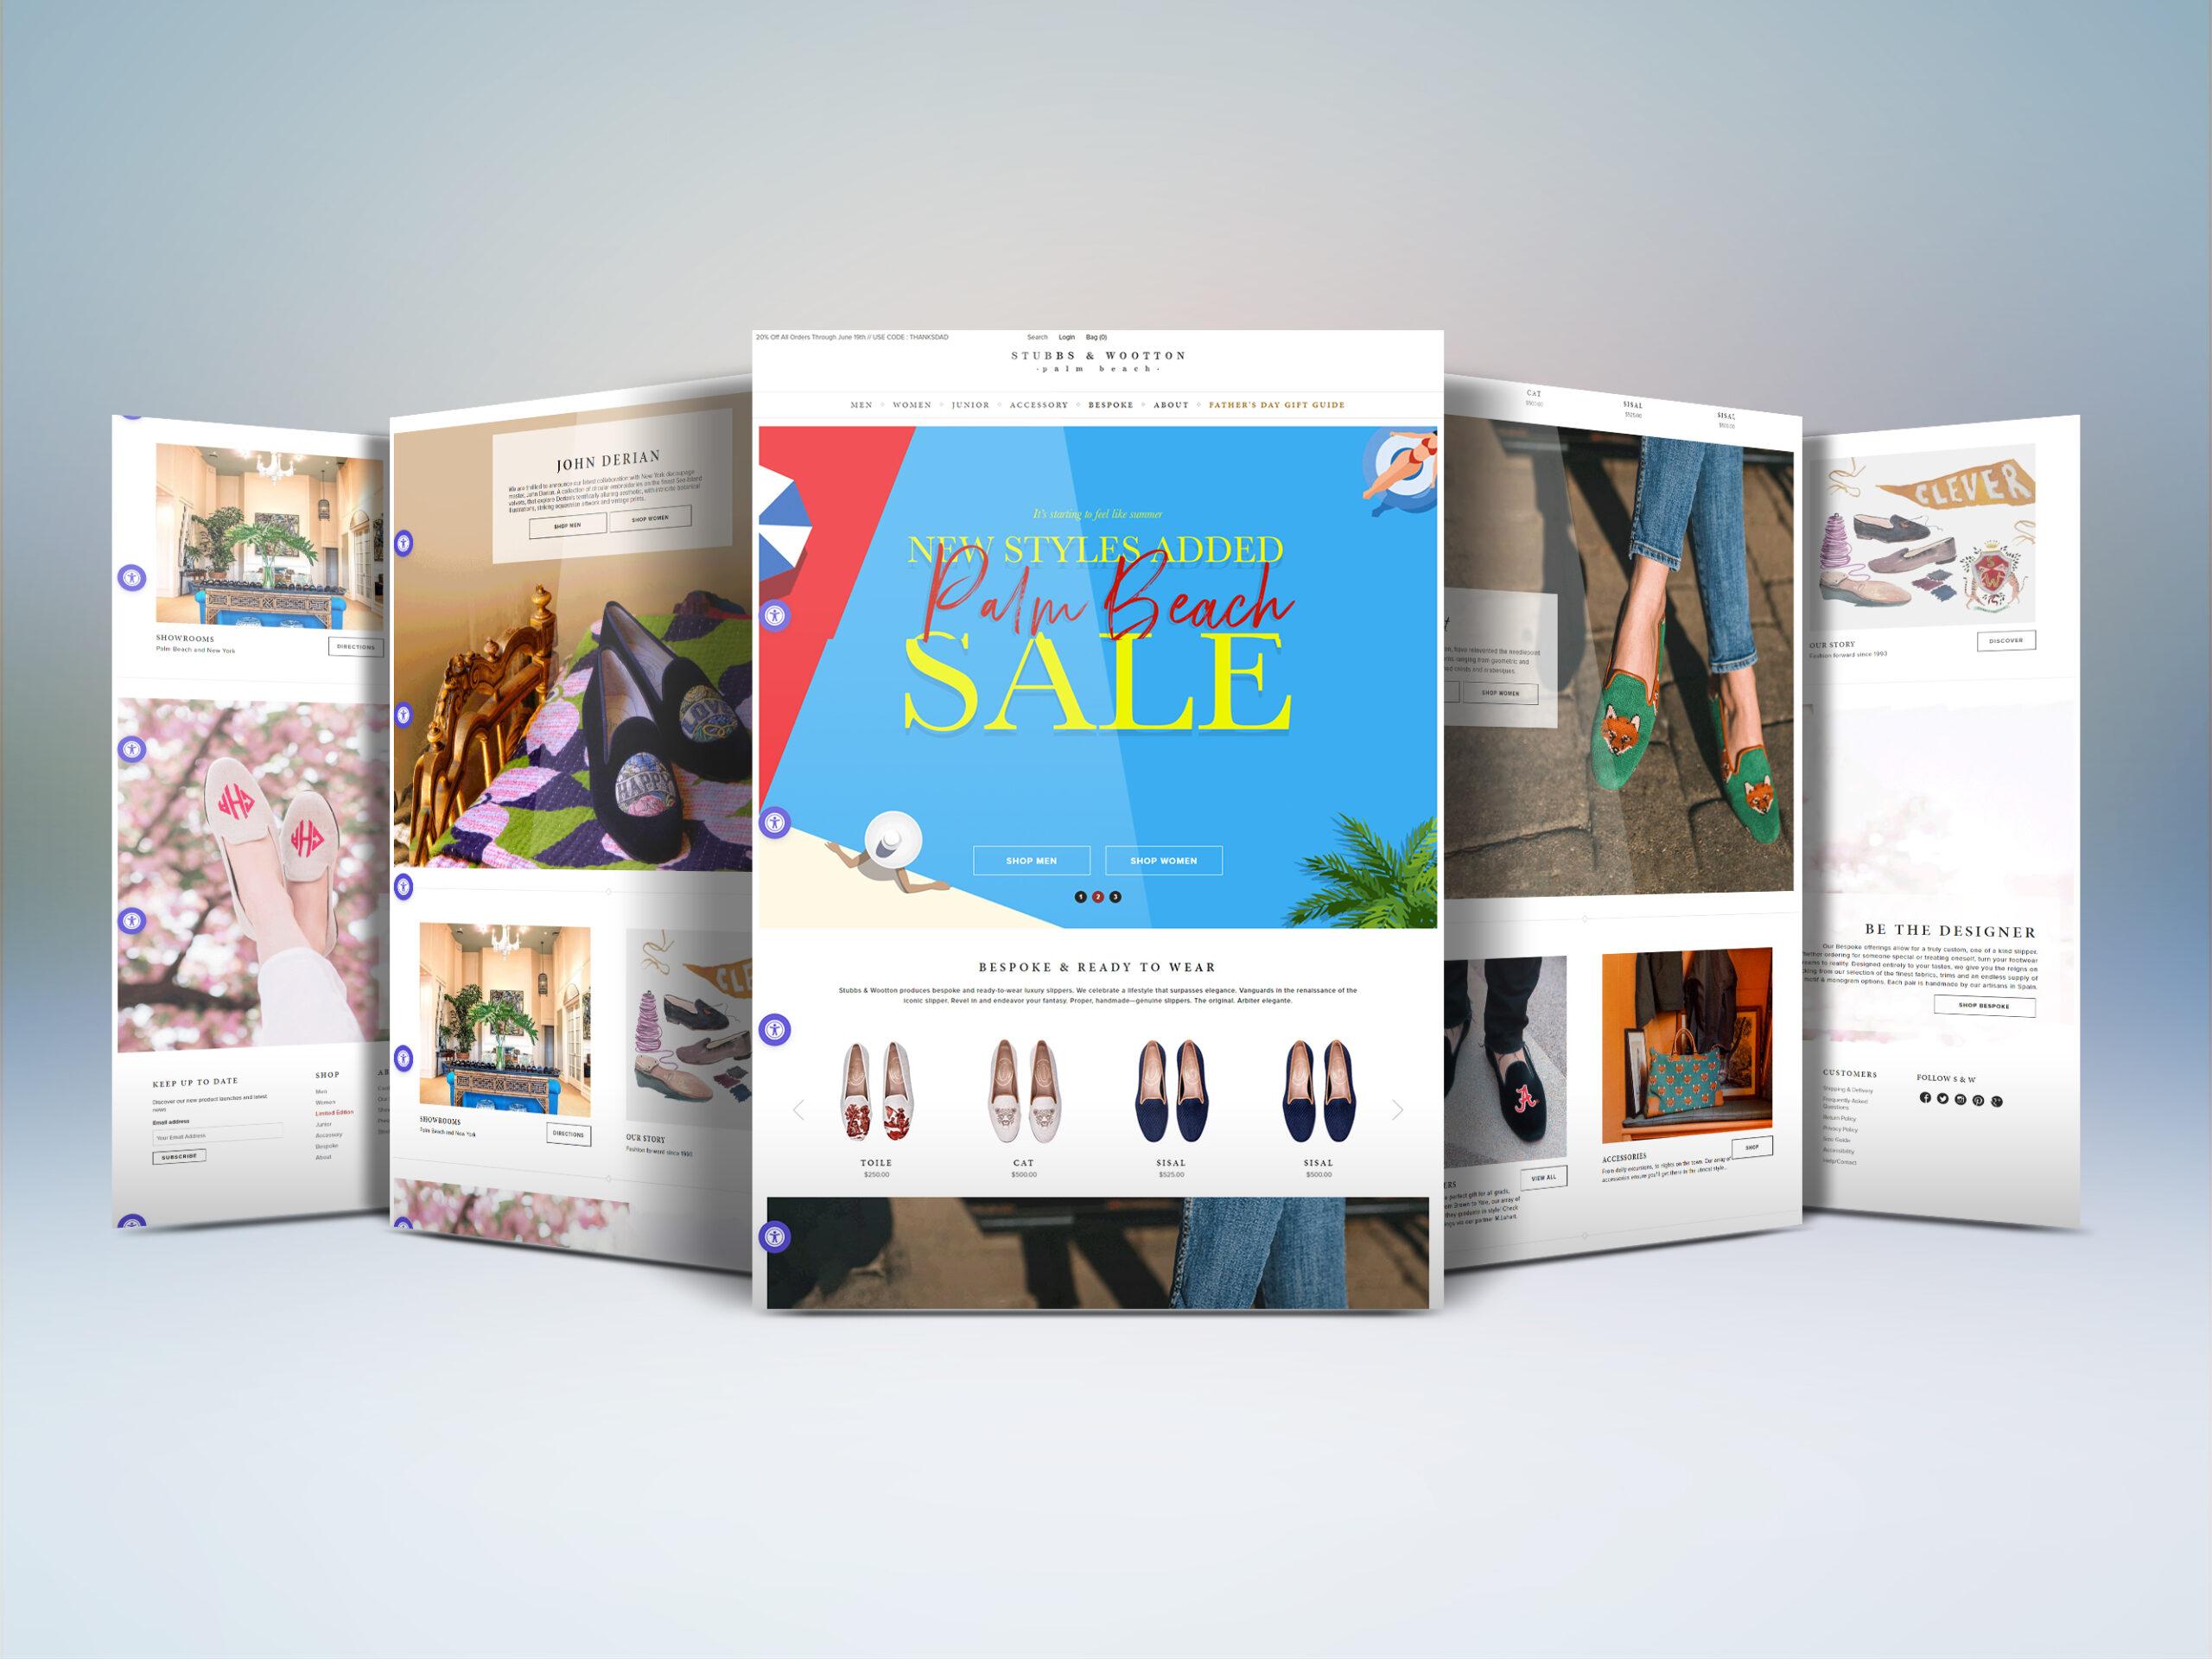 webdesign06